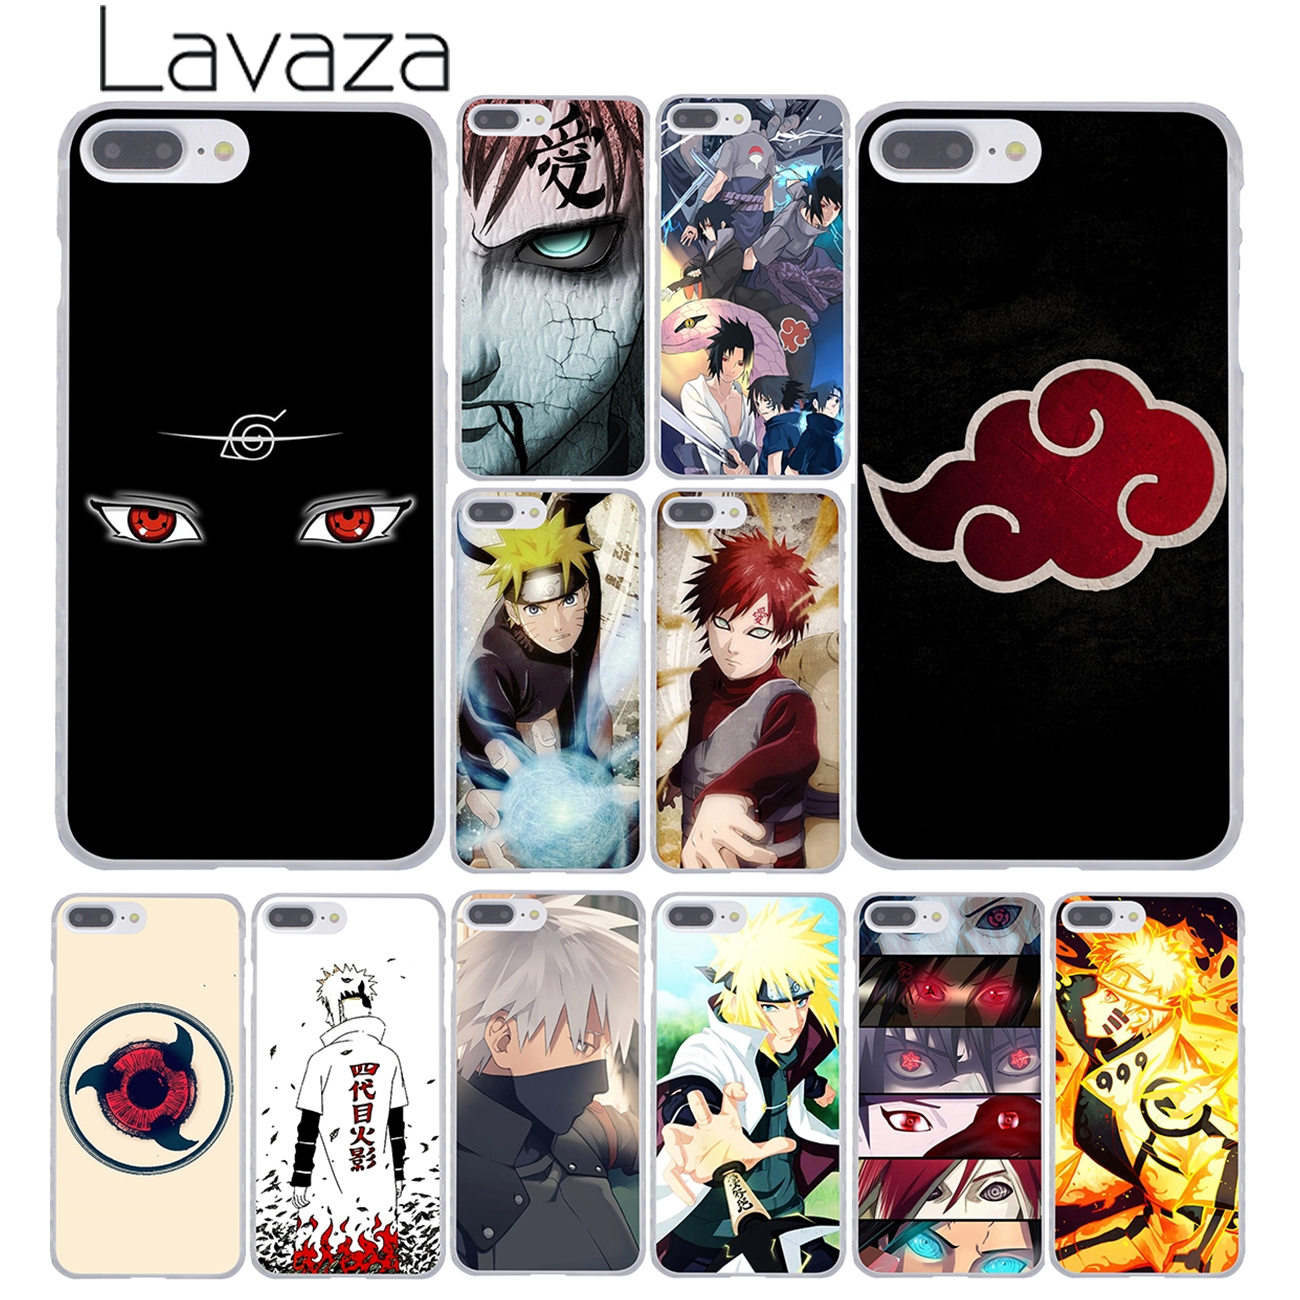 Naruto Hard Cover Case for iPhone \u2013 animefunstore